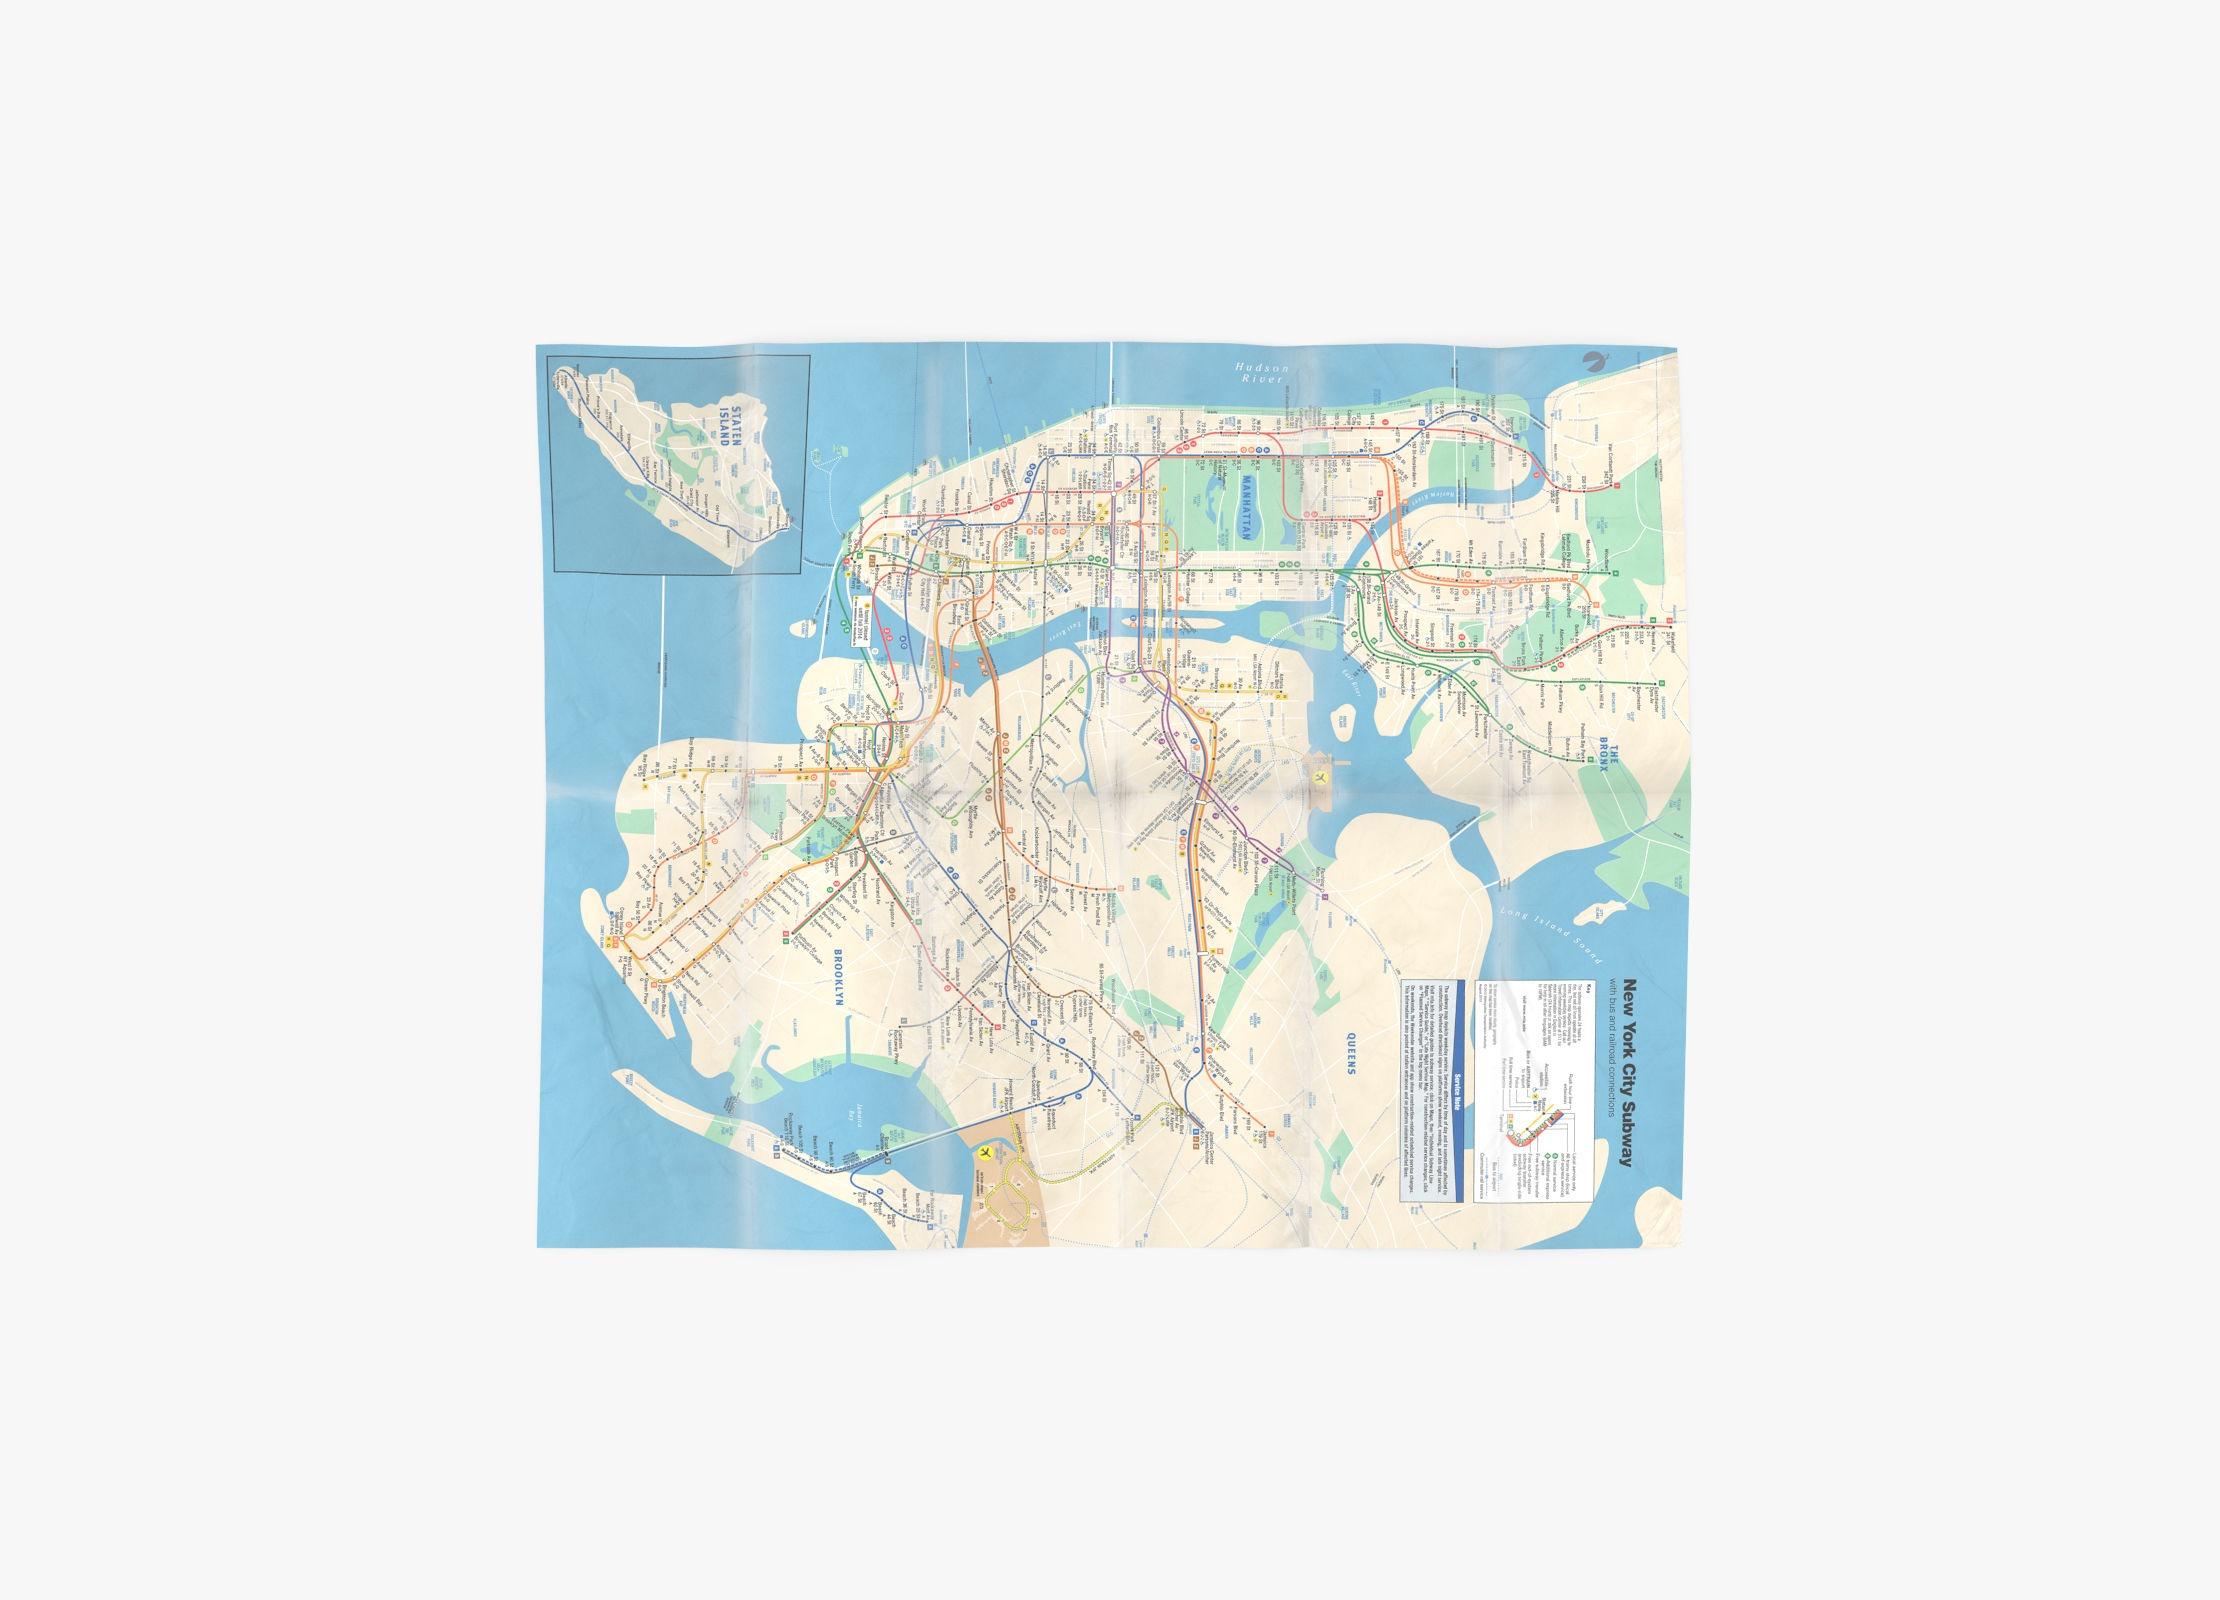 New York Subway Map 02 - reel 1